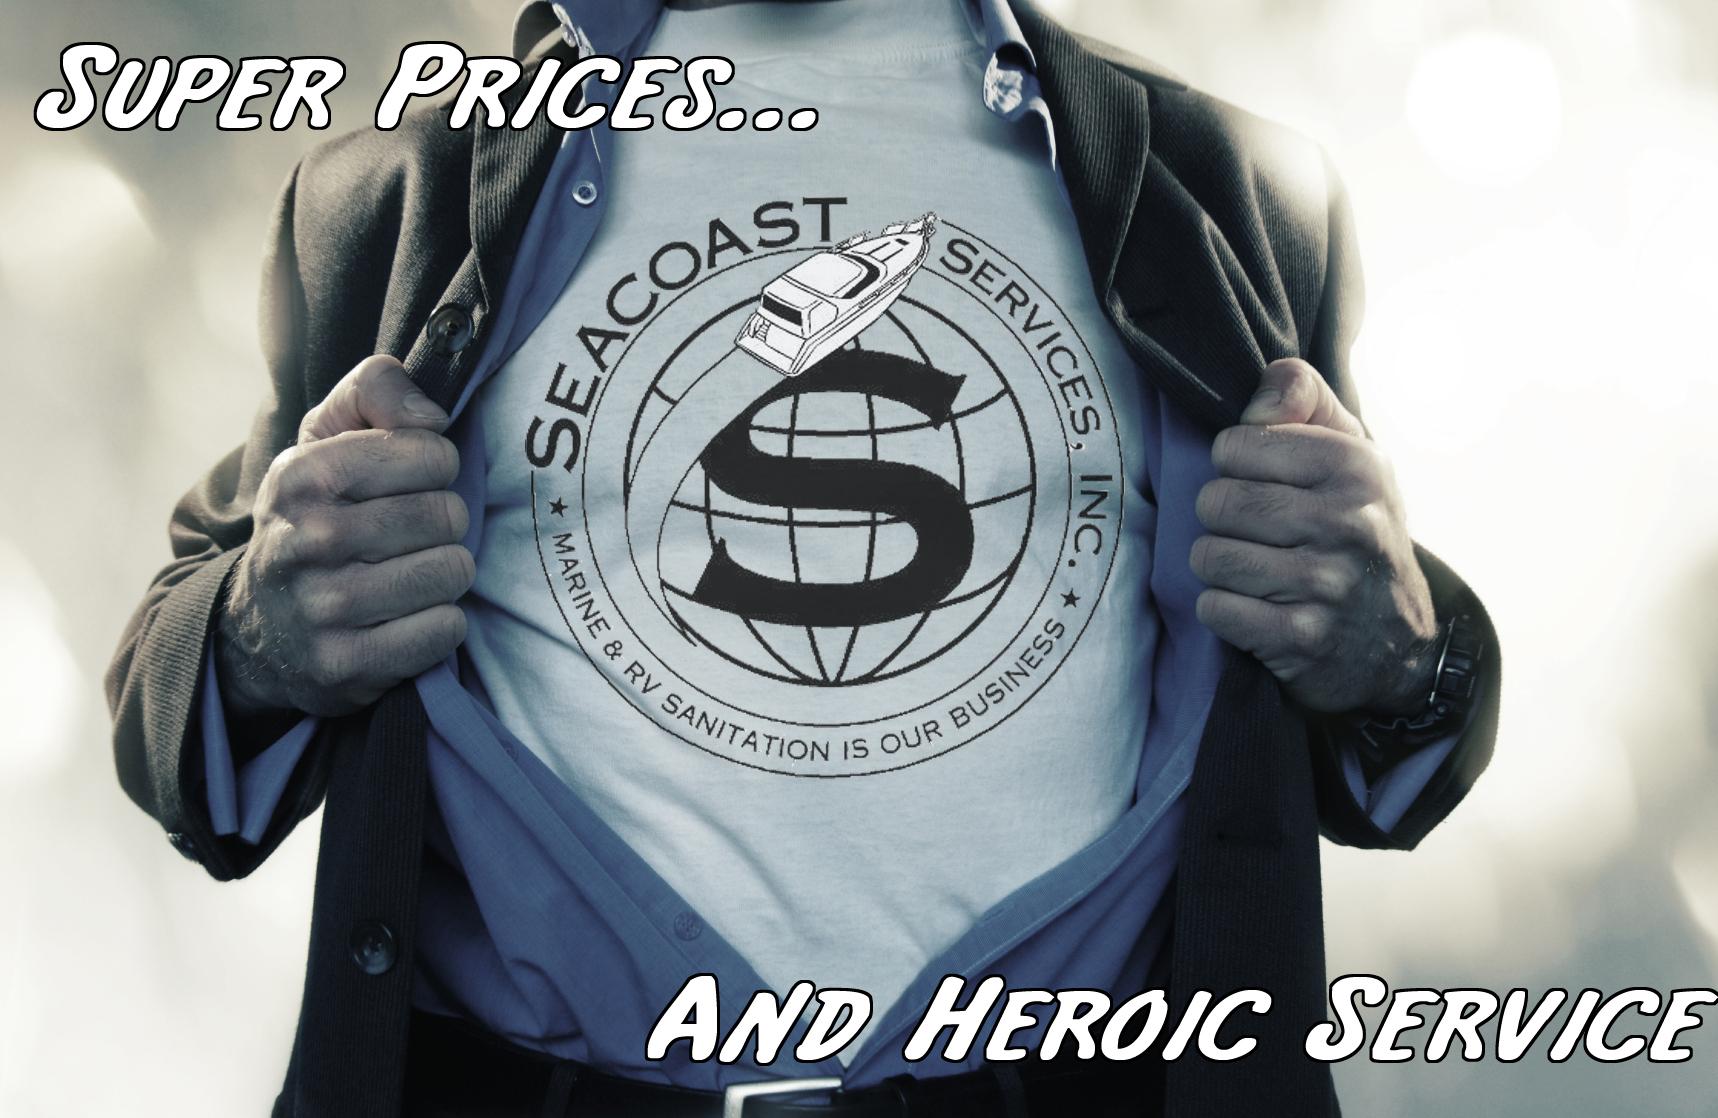 seacoast-superhero-copy.jpg